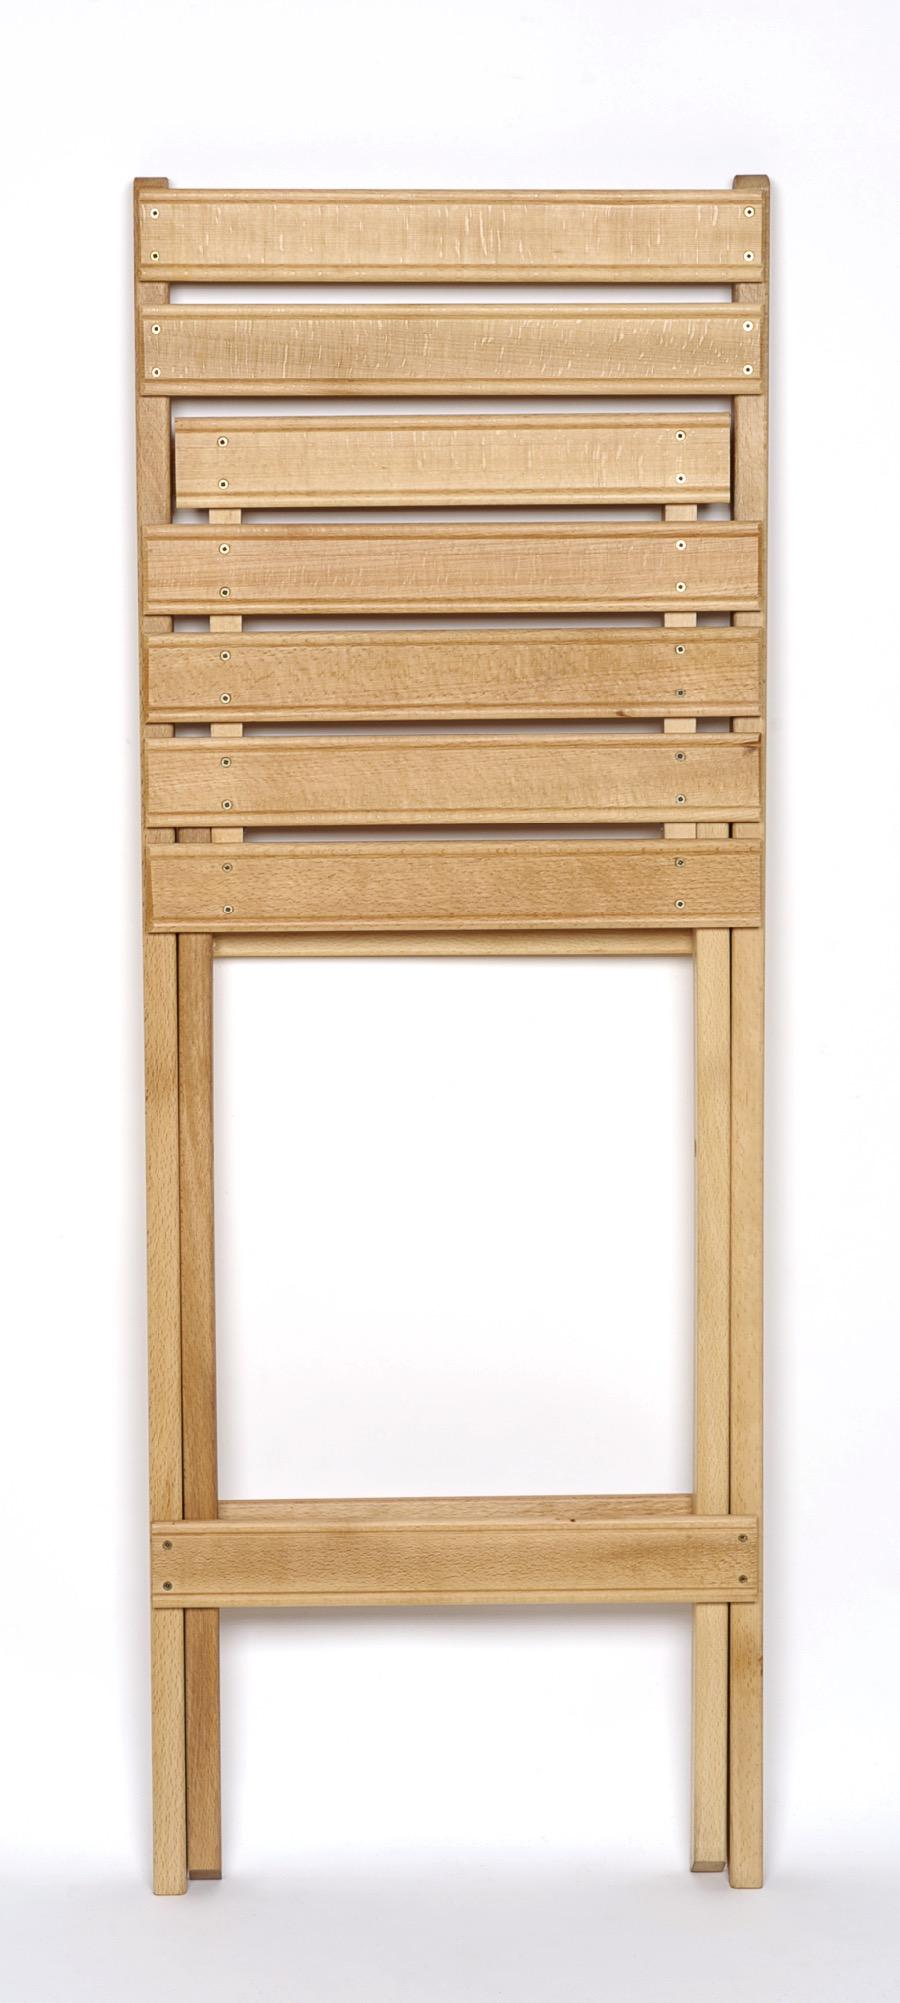 Sillas altas plegables de madera c diz garc a hermanos for Sillas de escritorio altas